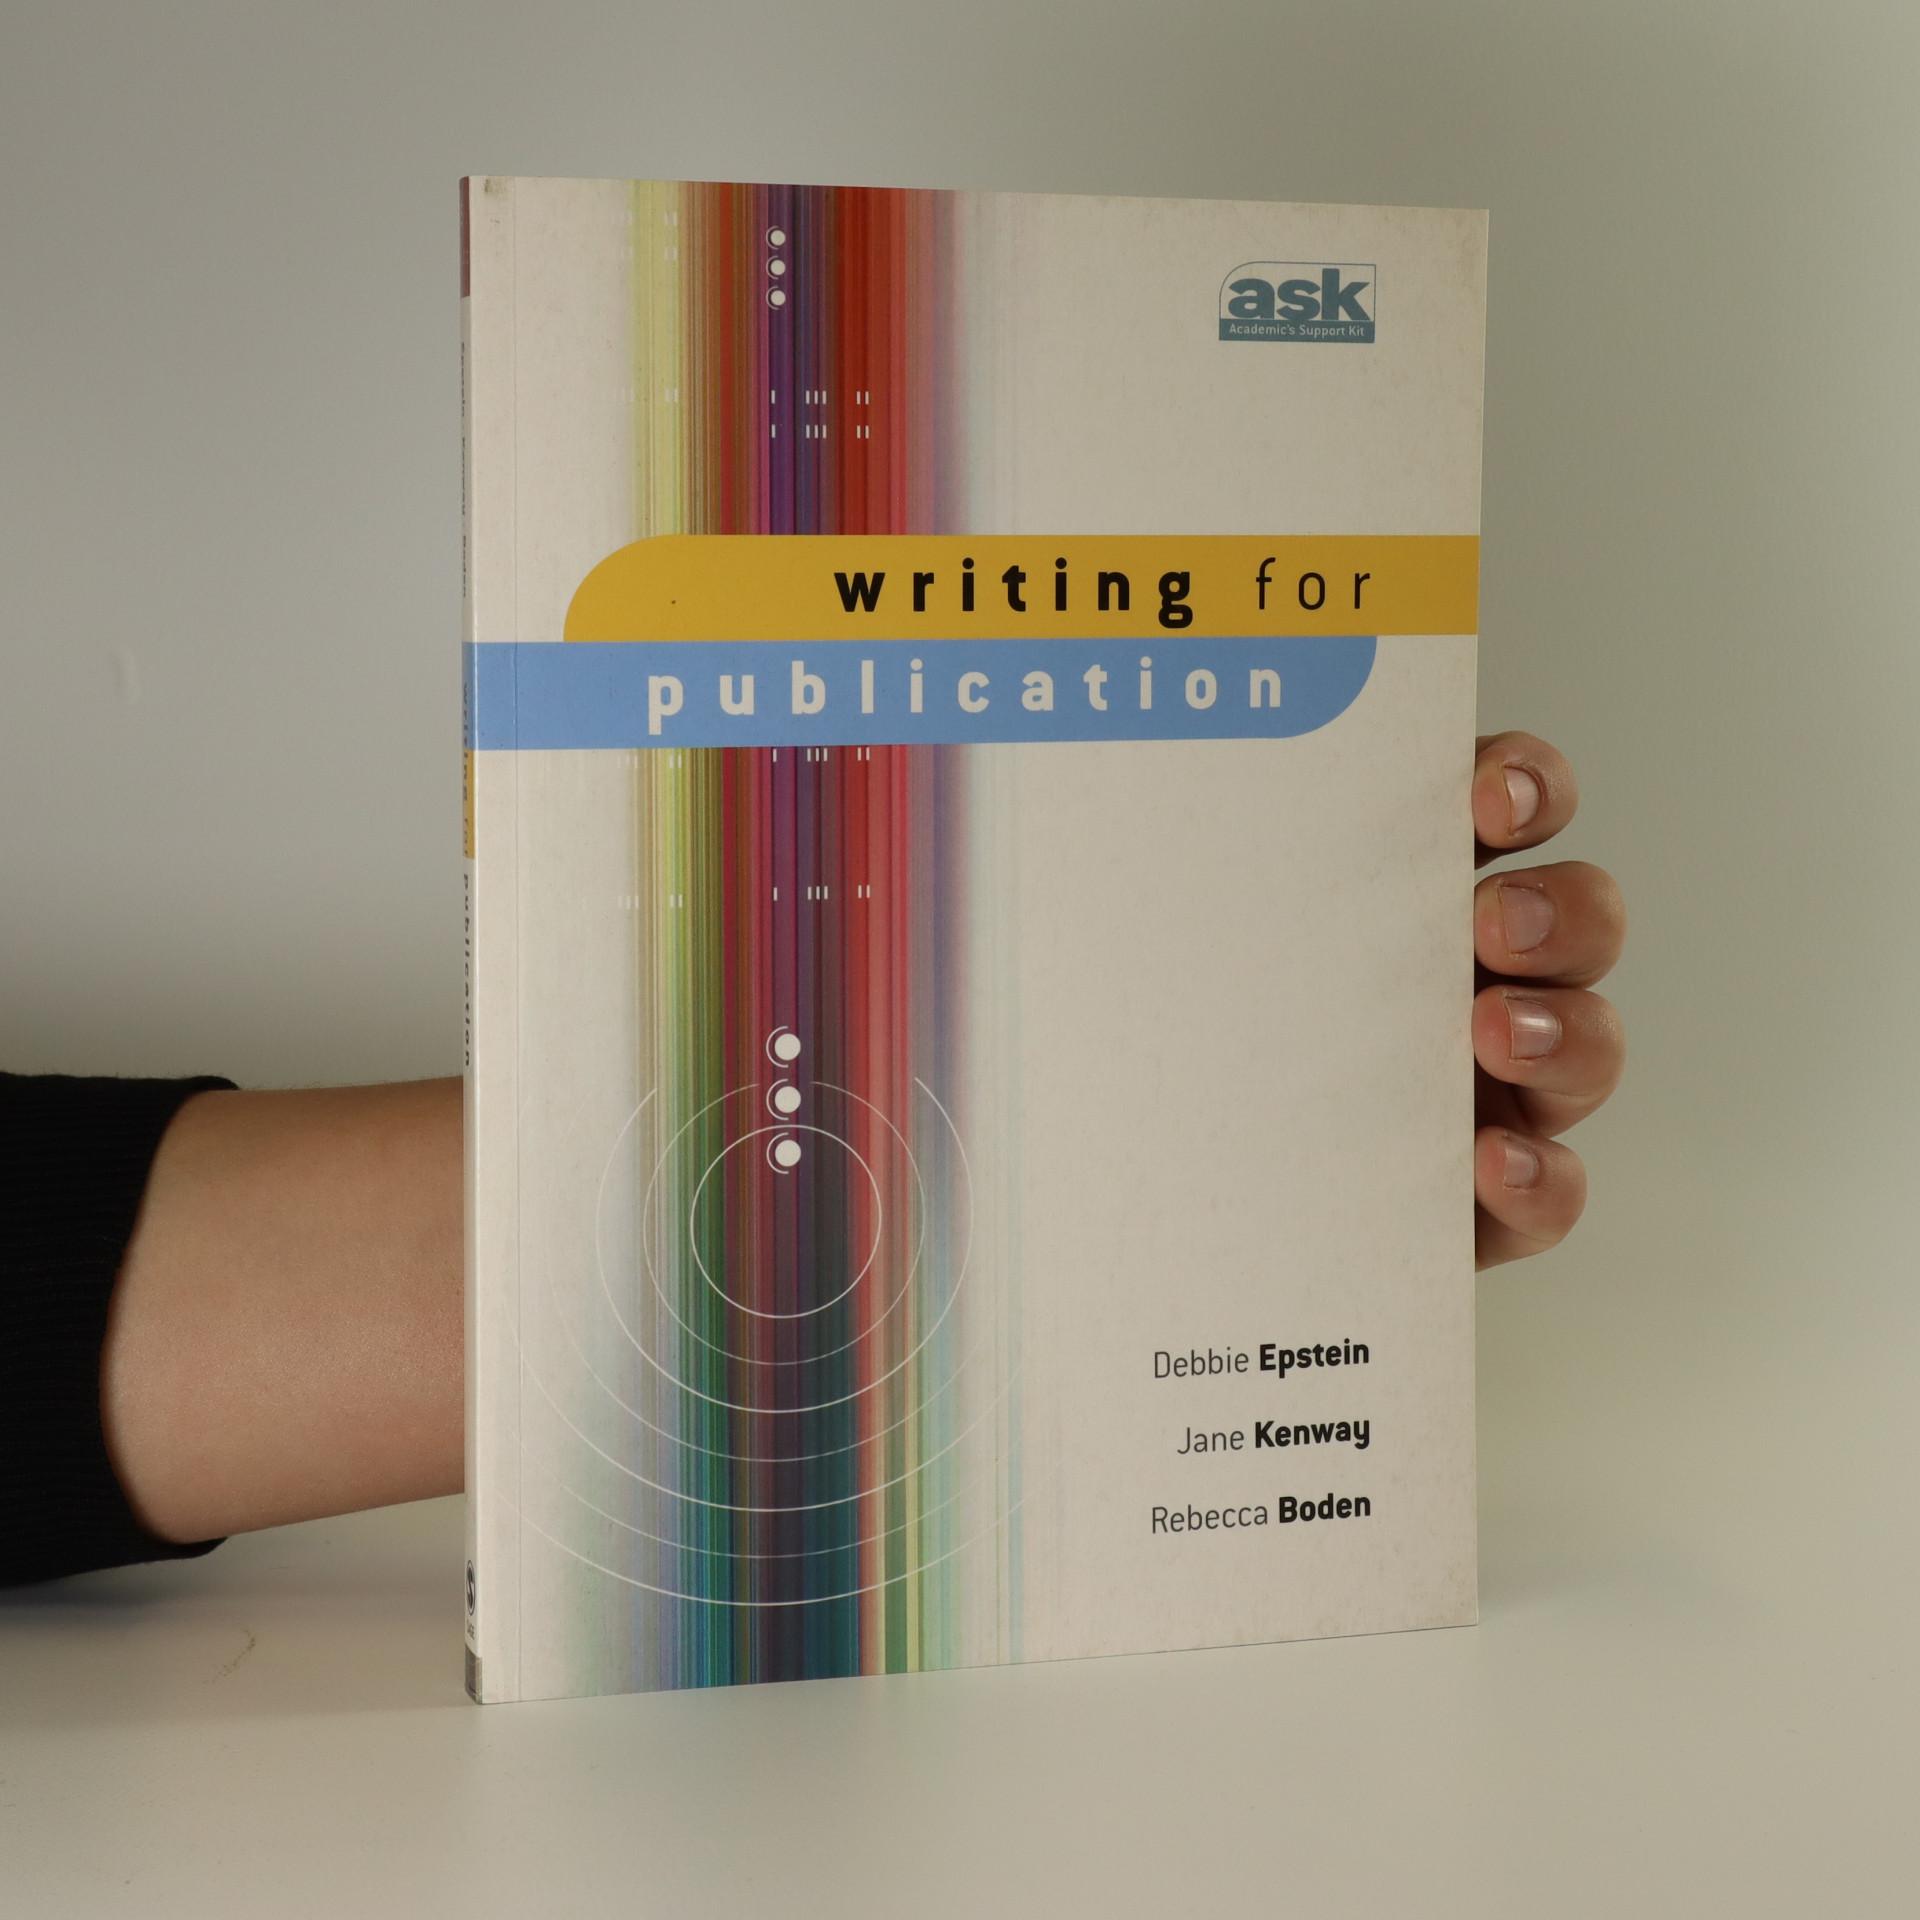 antikvární kniha Writing for publication, neuveden